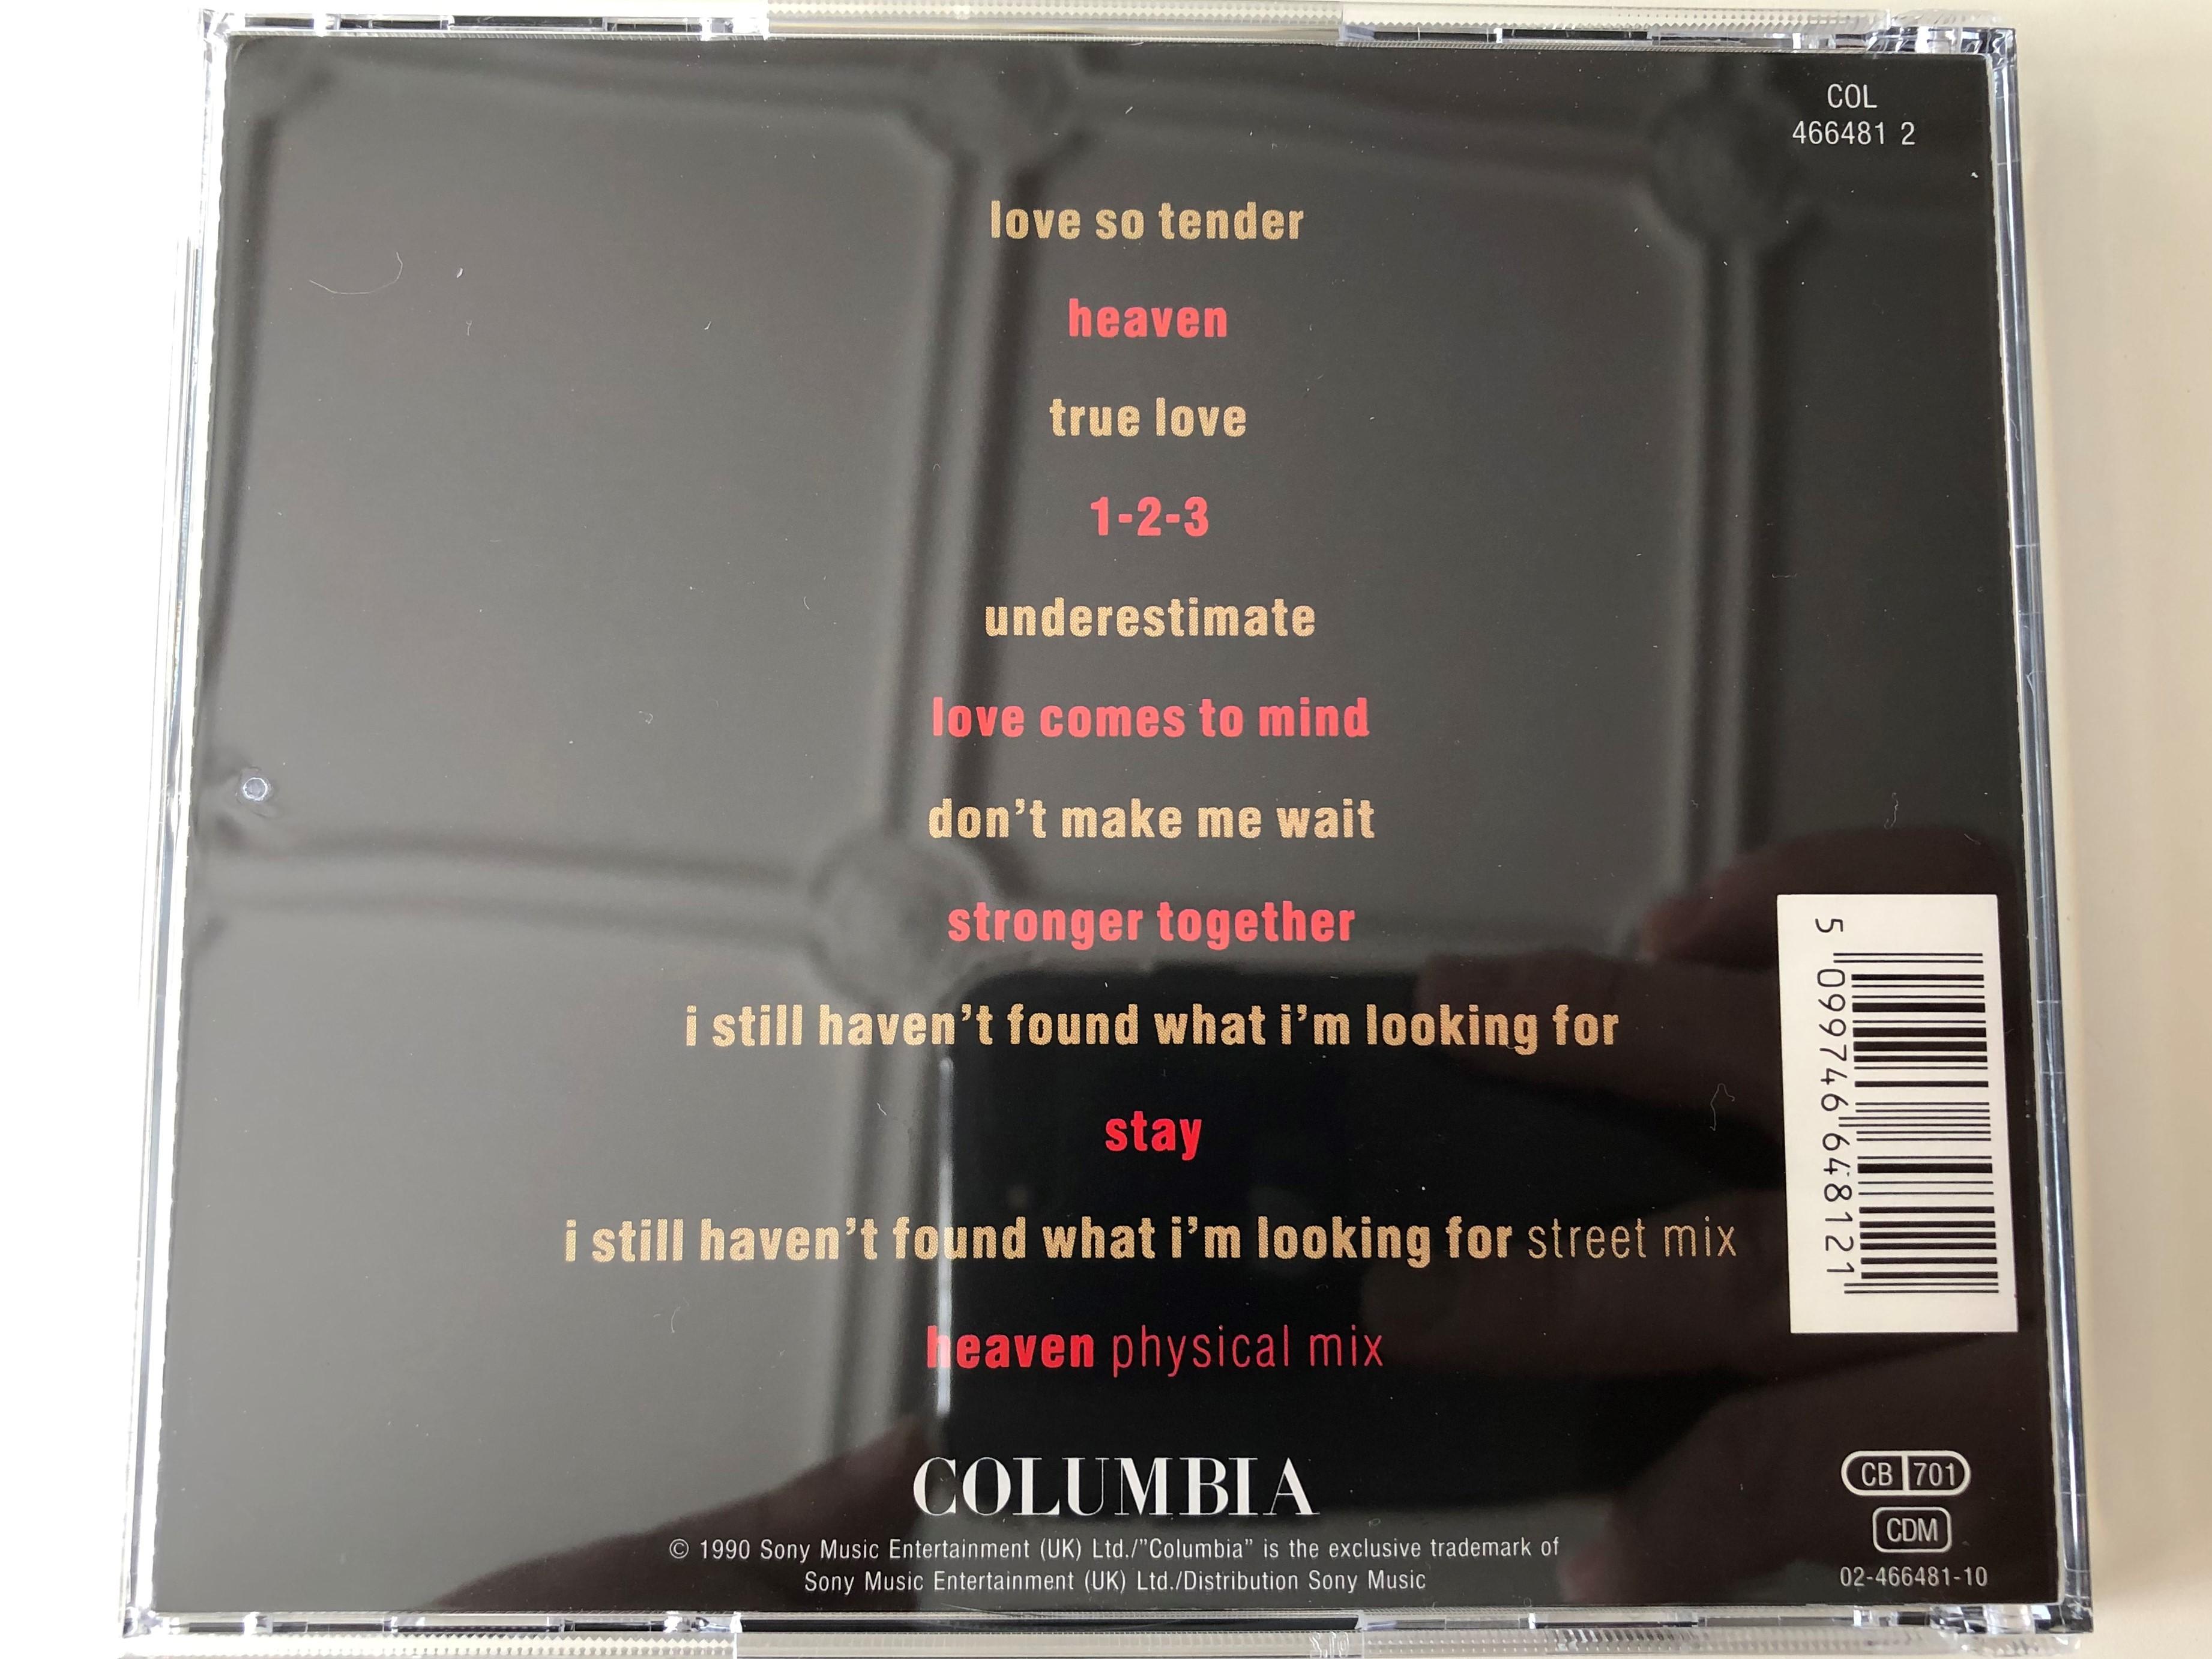 the-chimes-columbia-audio-cd-1990-466481-2-6-.jpg